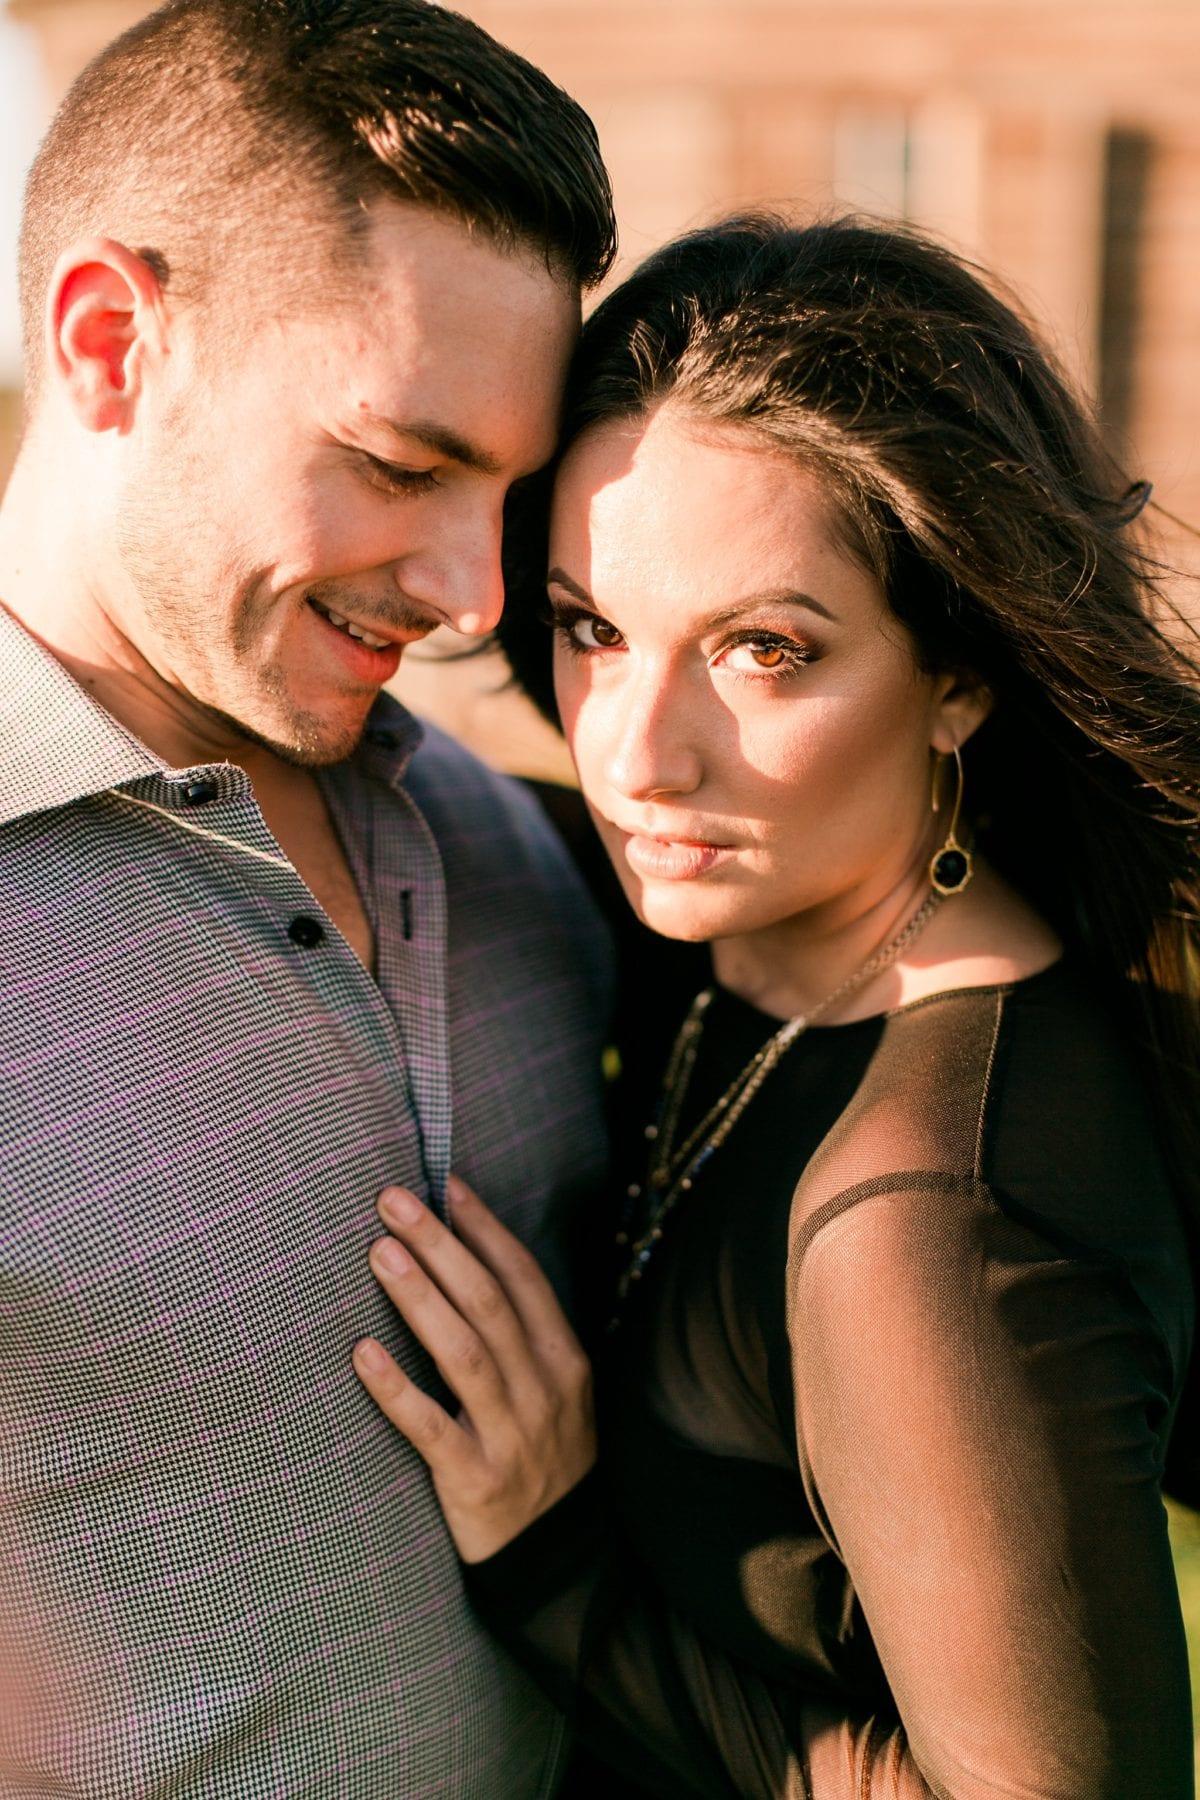 Manassas Battlefield Portraits Virginia Wedding Photographer Megan Kelsey Photography Lianne & Chris-95.jpg